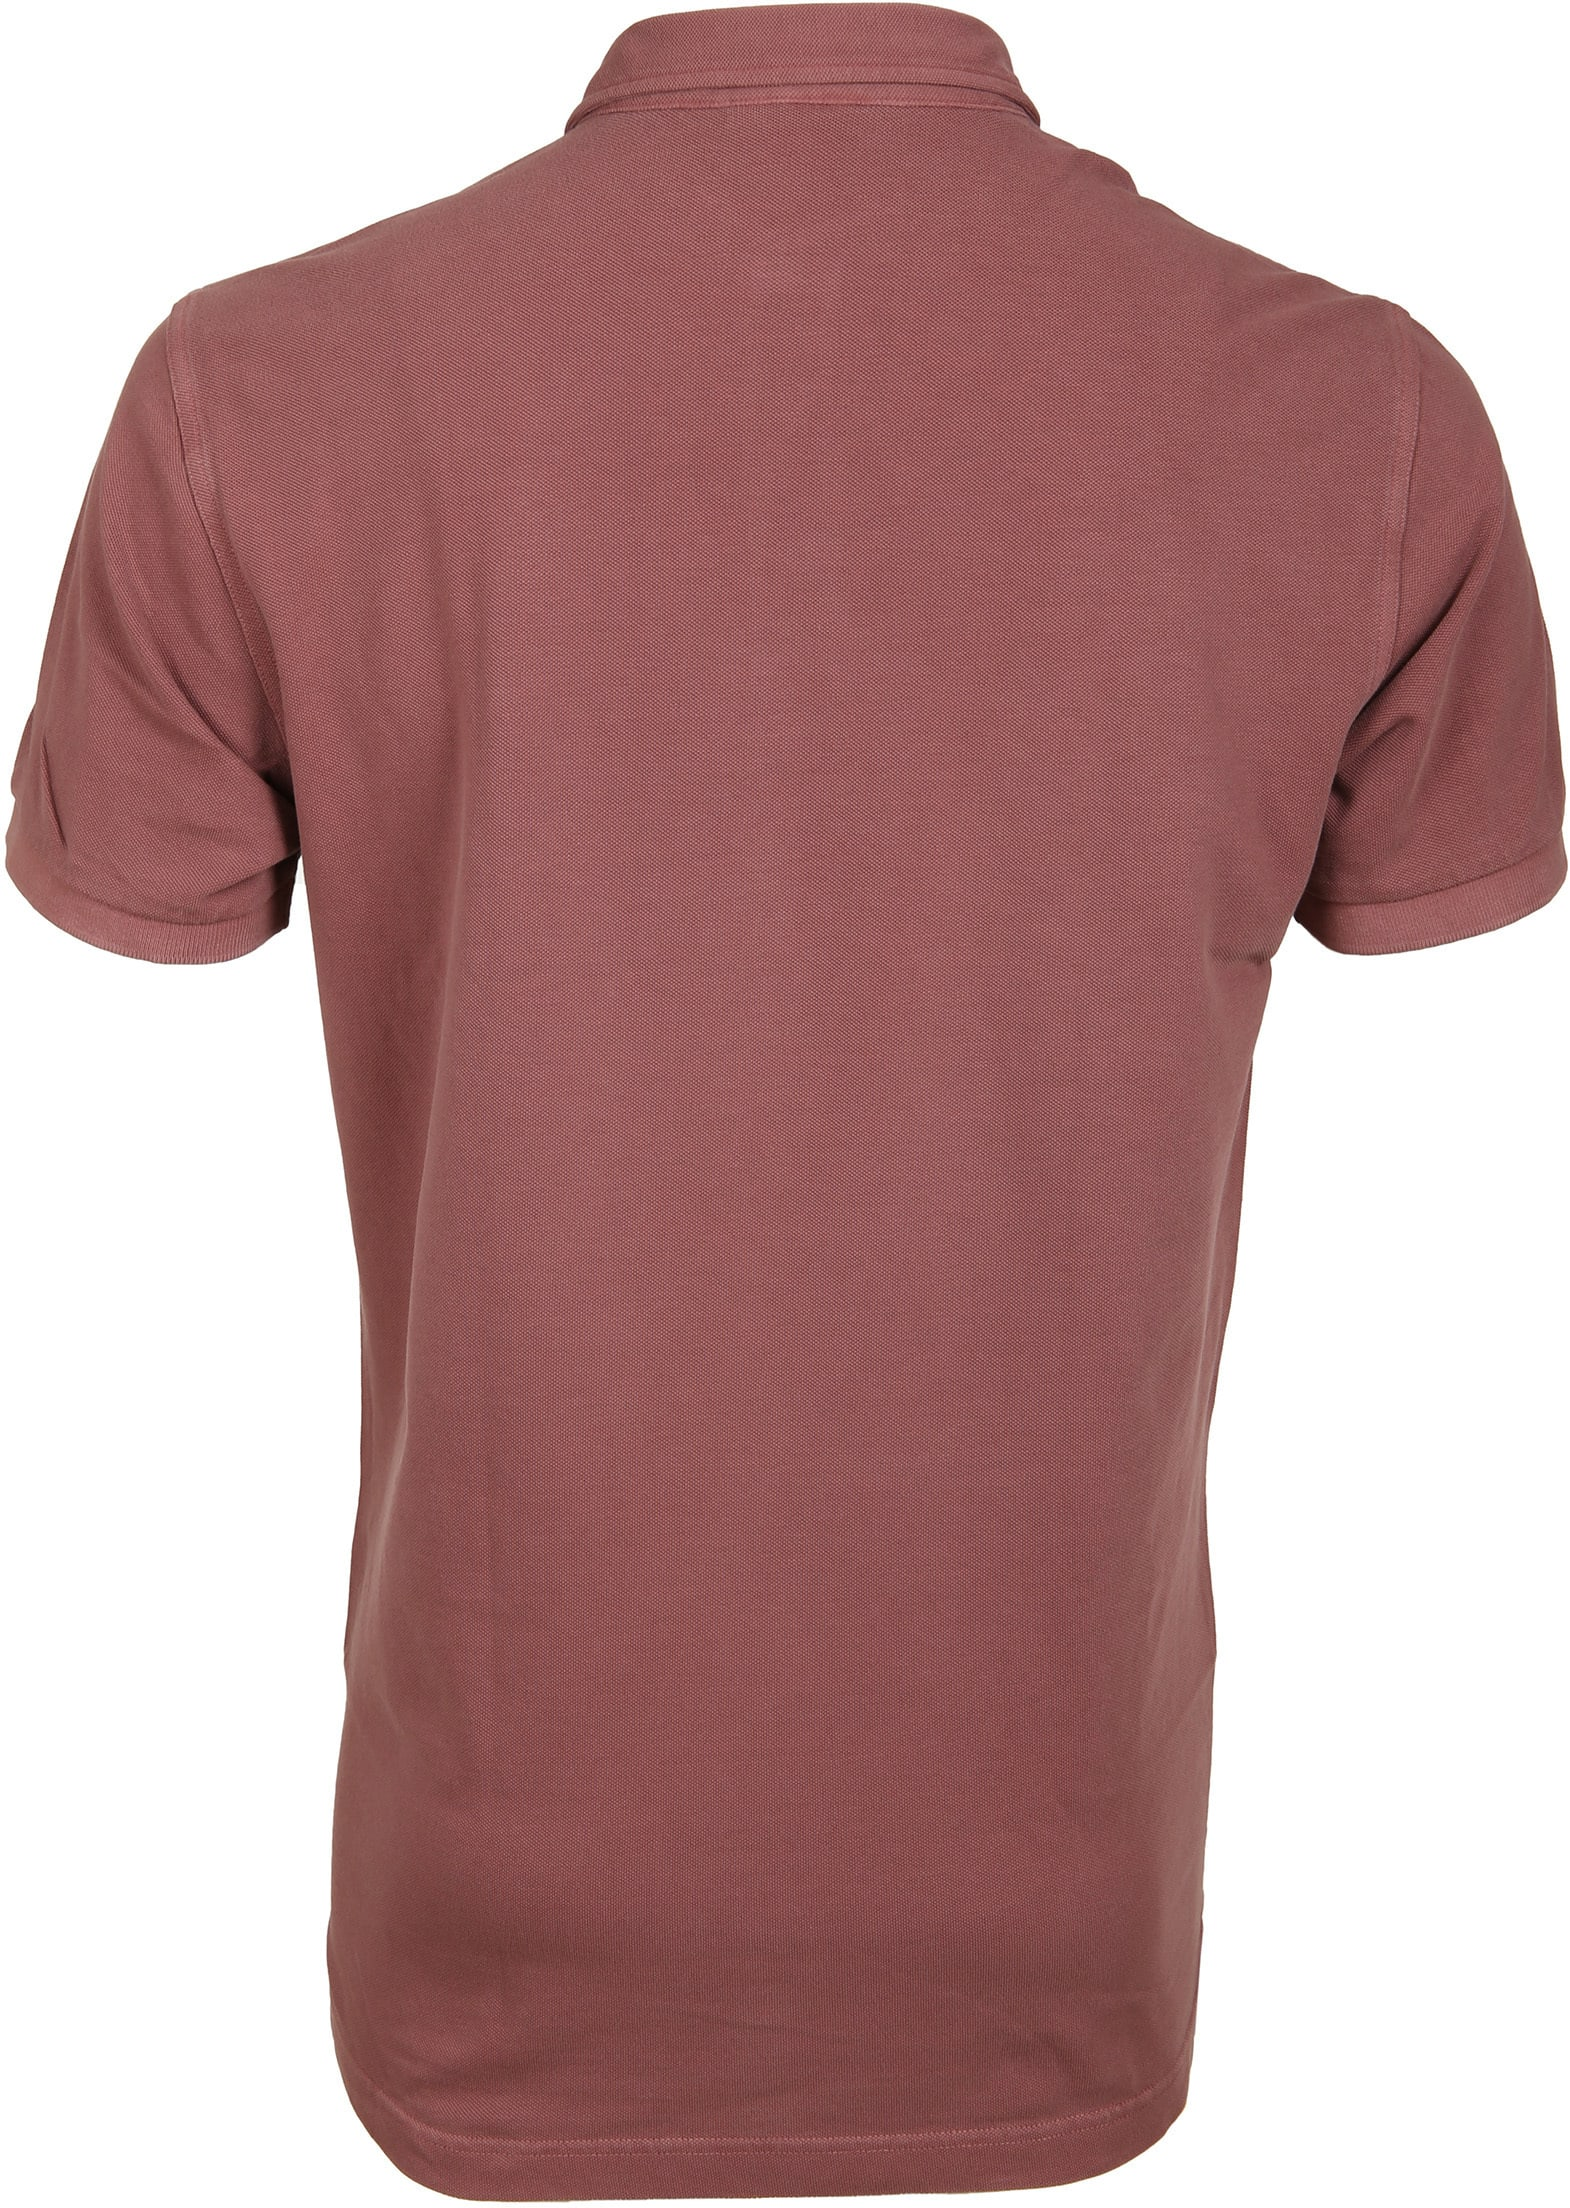 Profuomo Poloshirt Garment Bordeaux foto 2